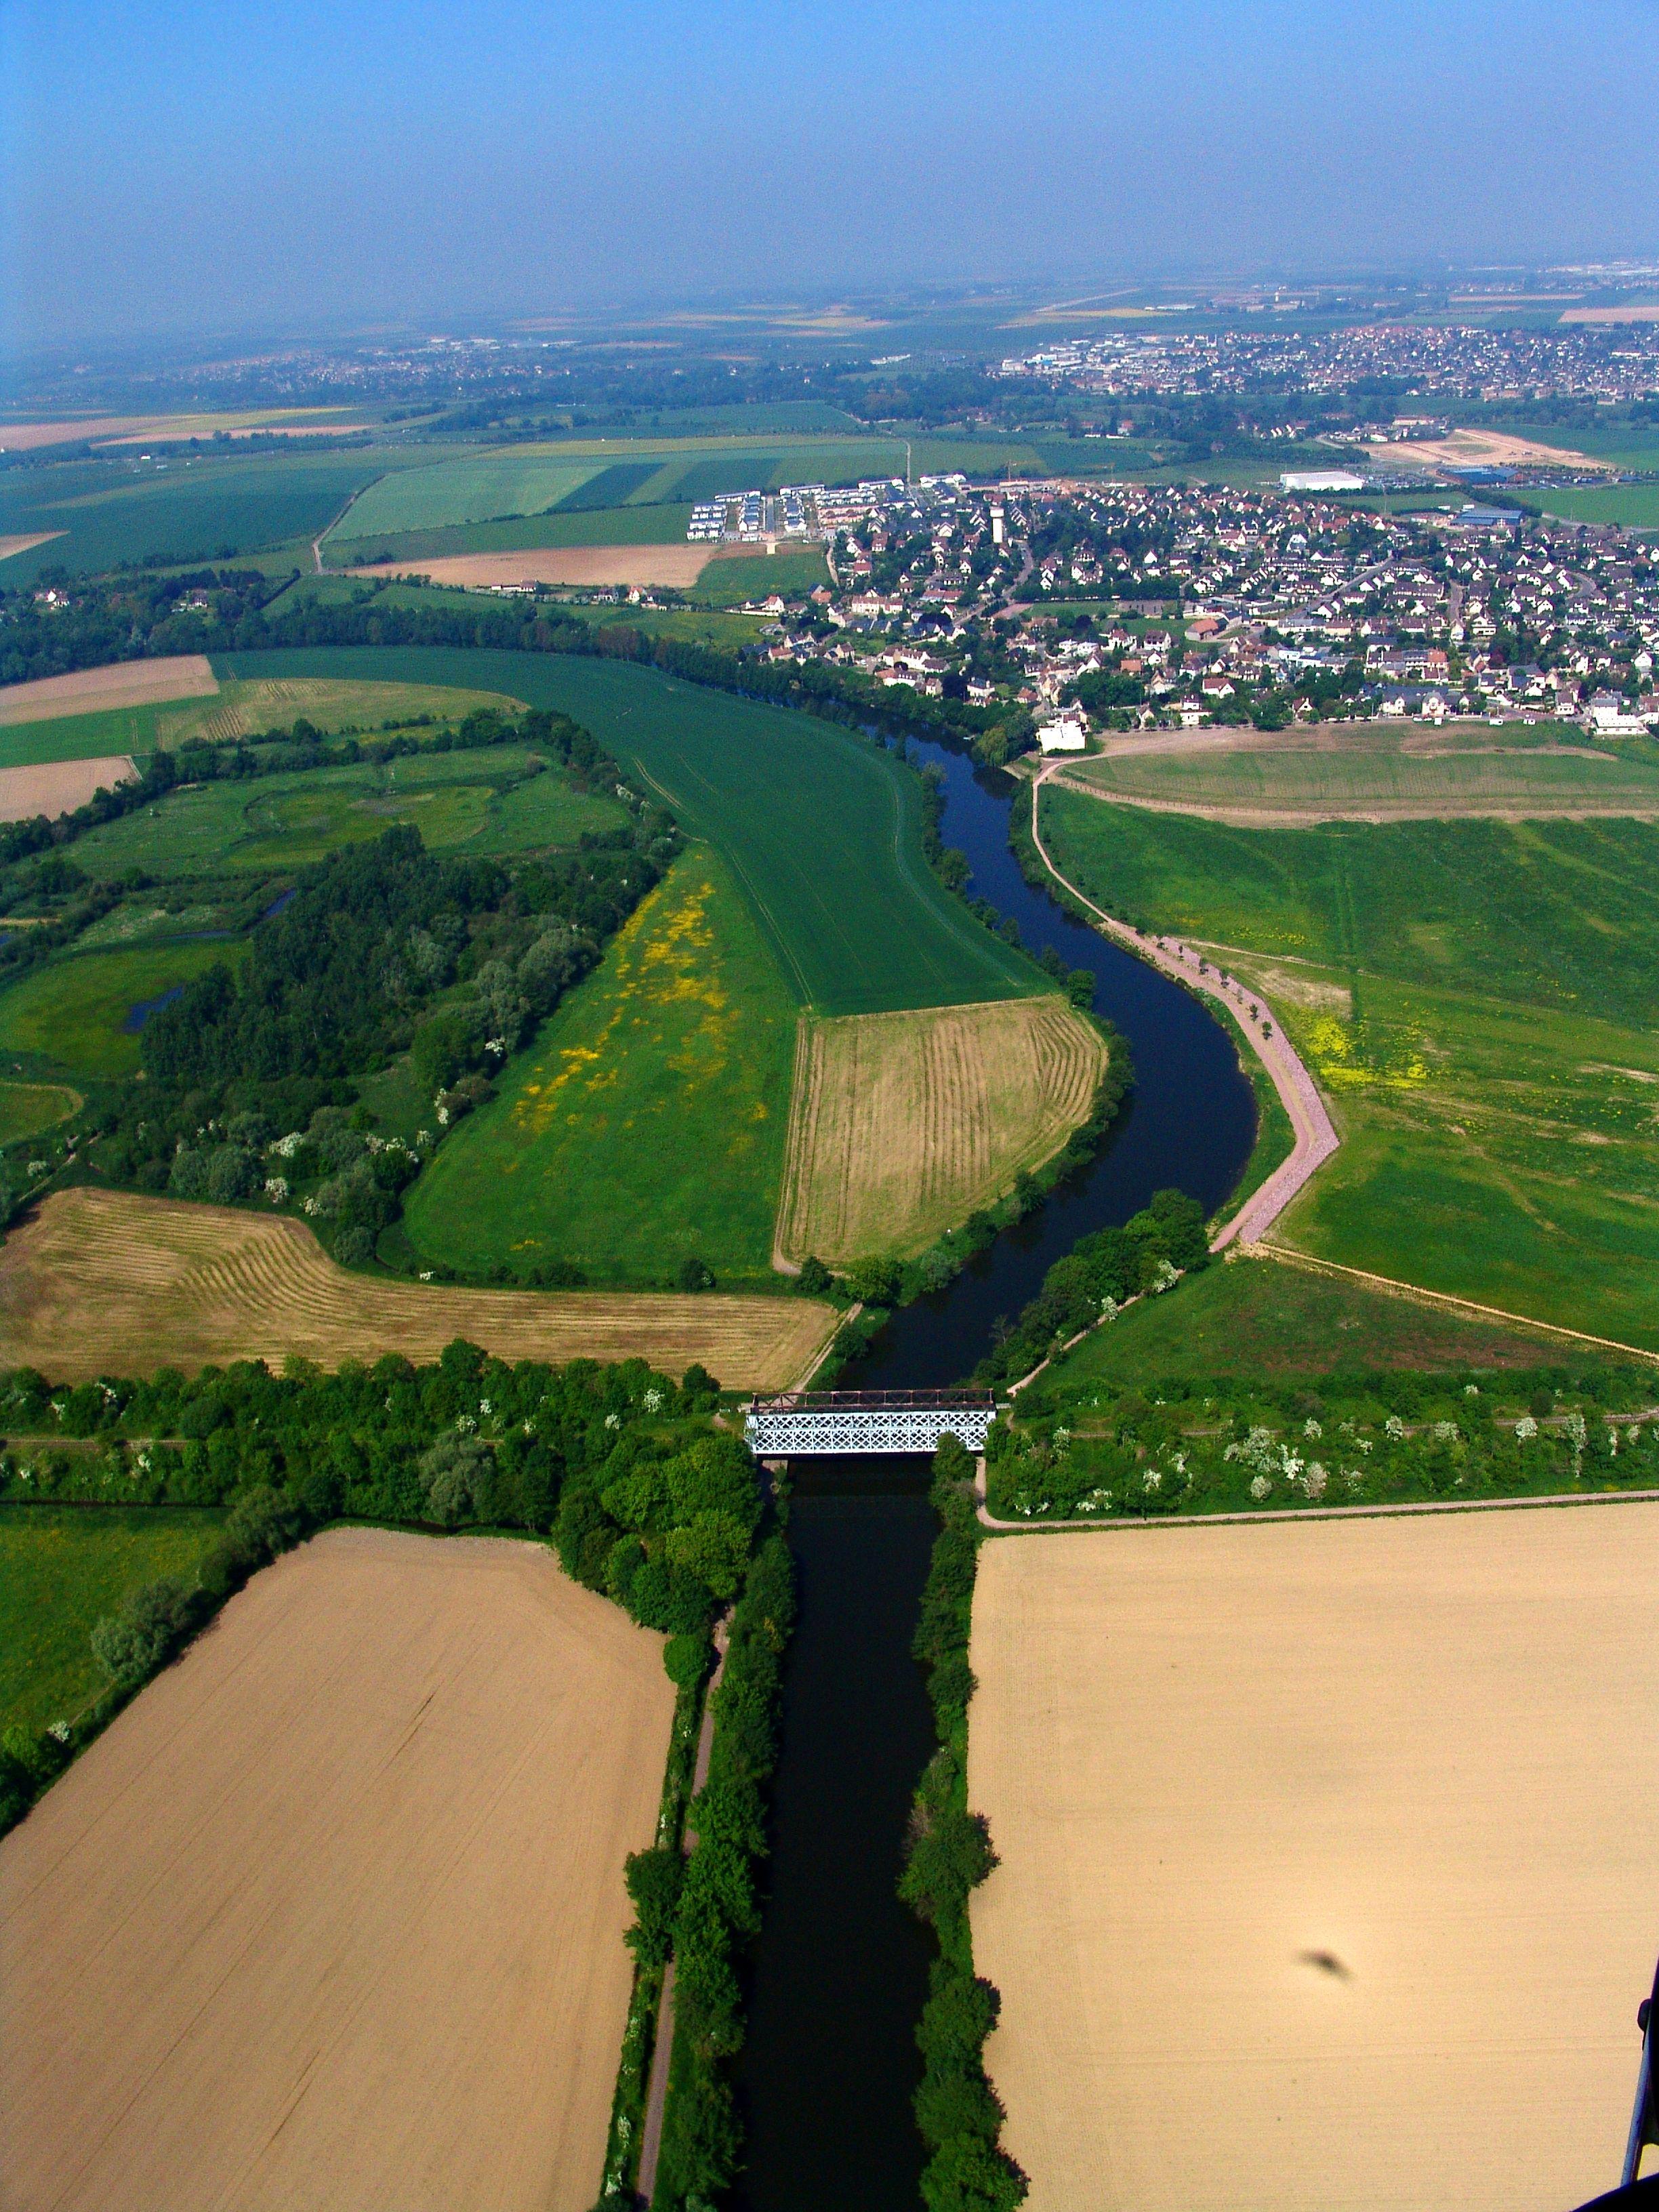 Paysage du fleuve l'Orne